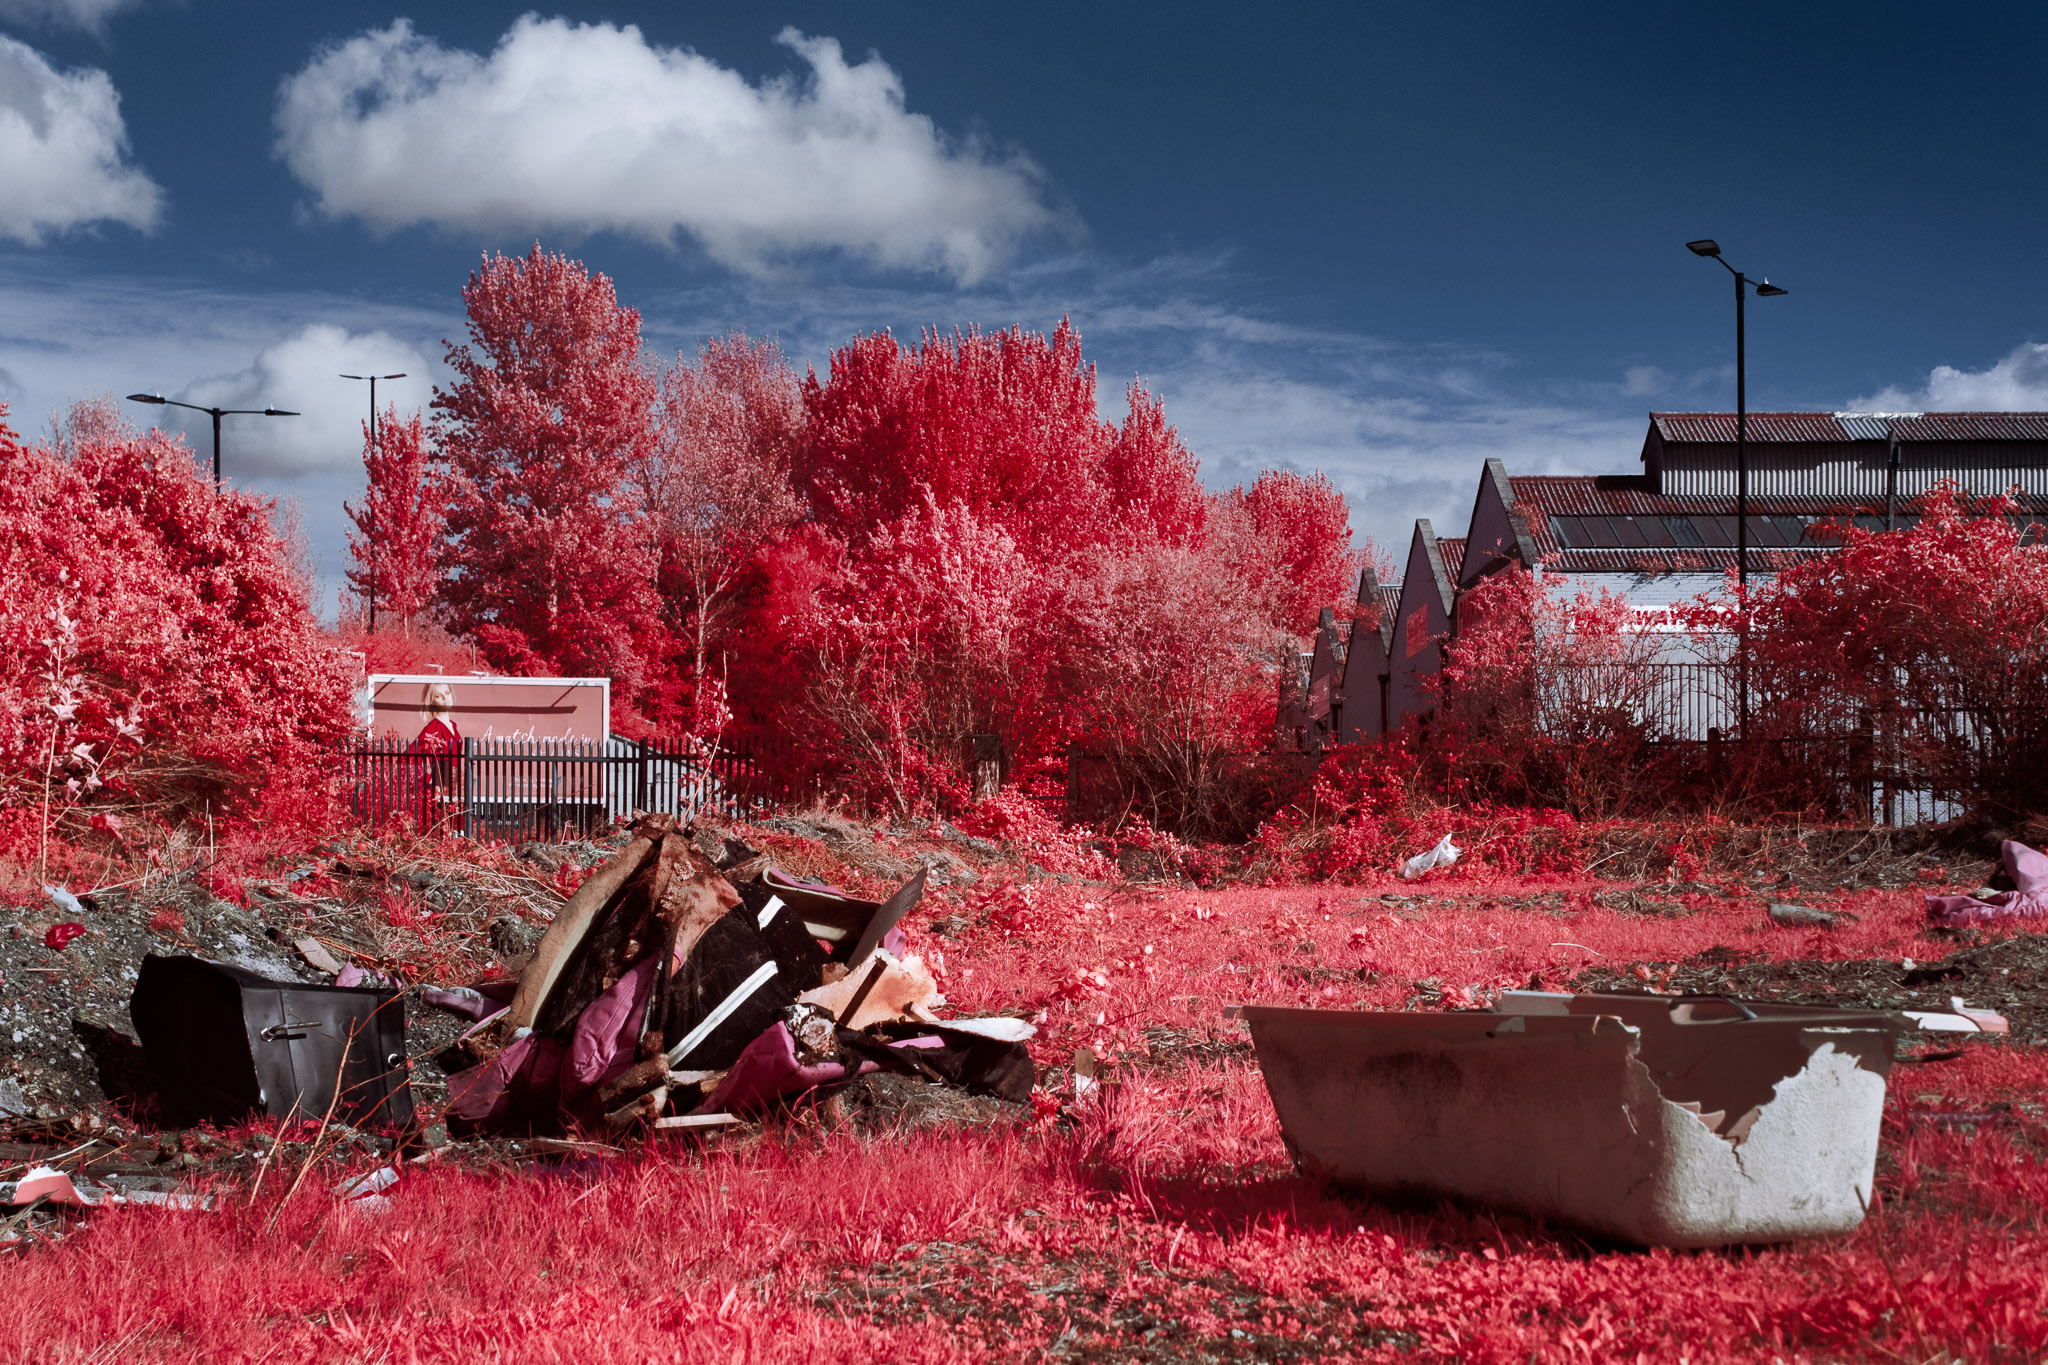 Kodak EIR Colour Infrared, Edgelands, Wasteland, Out of sight,  Bathtub ©Jonny Sutton